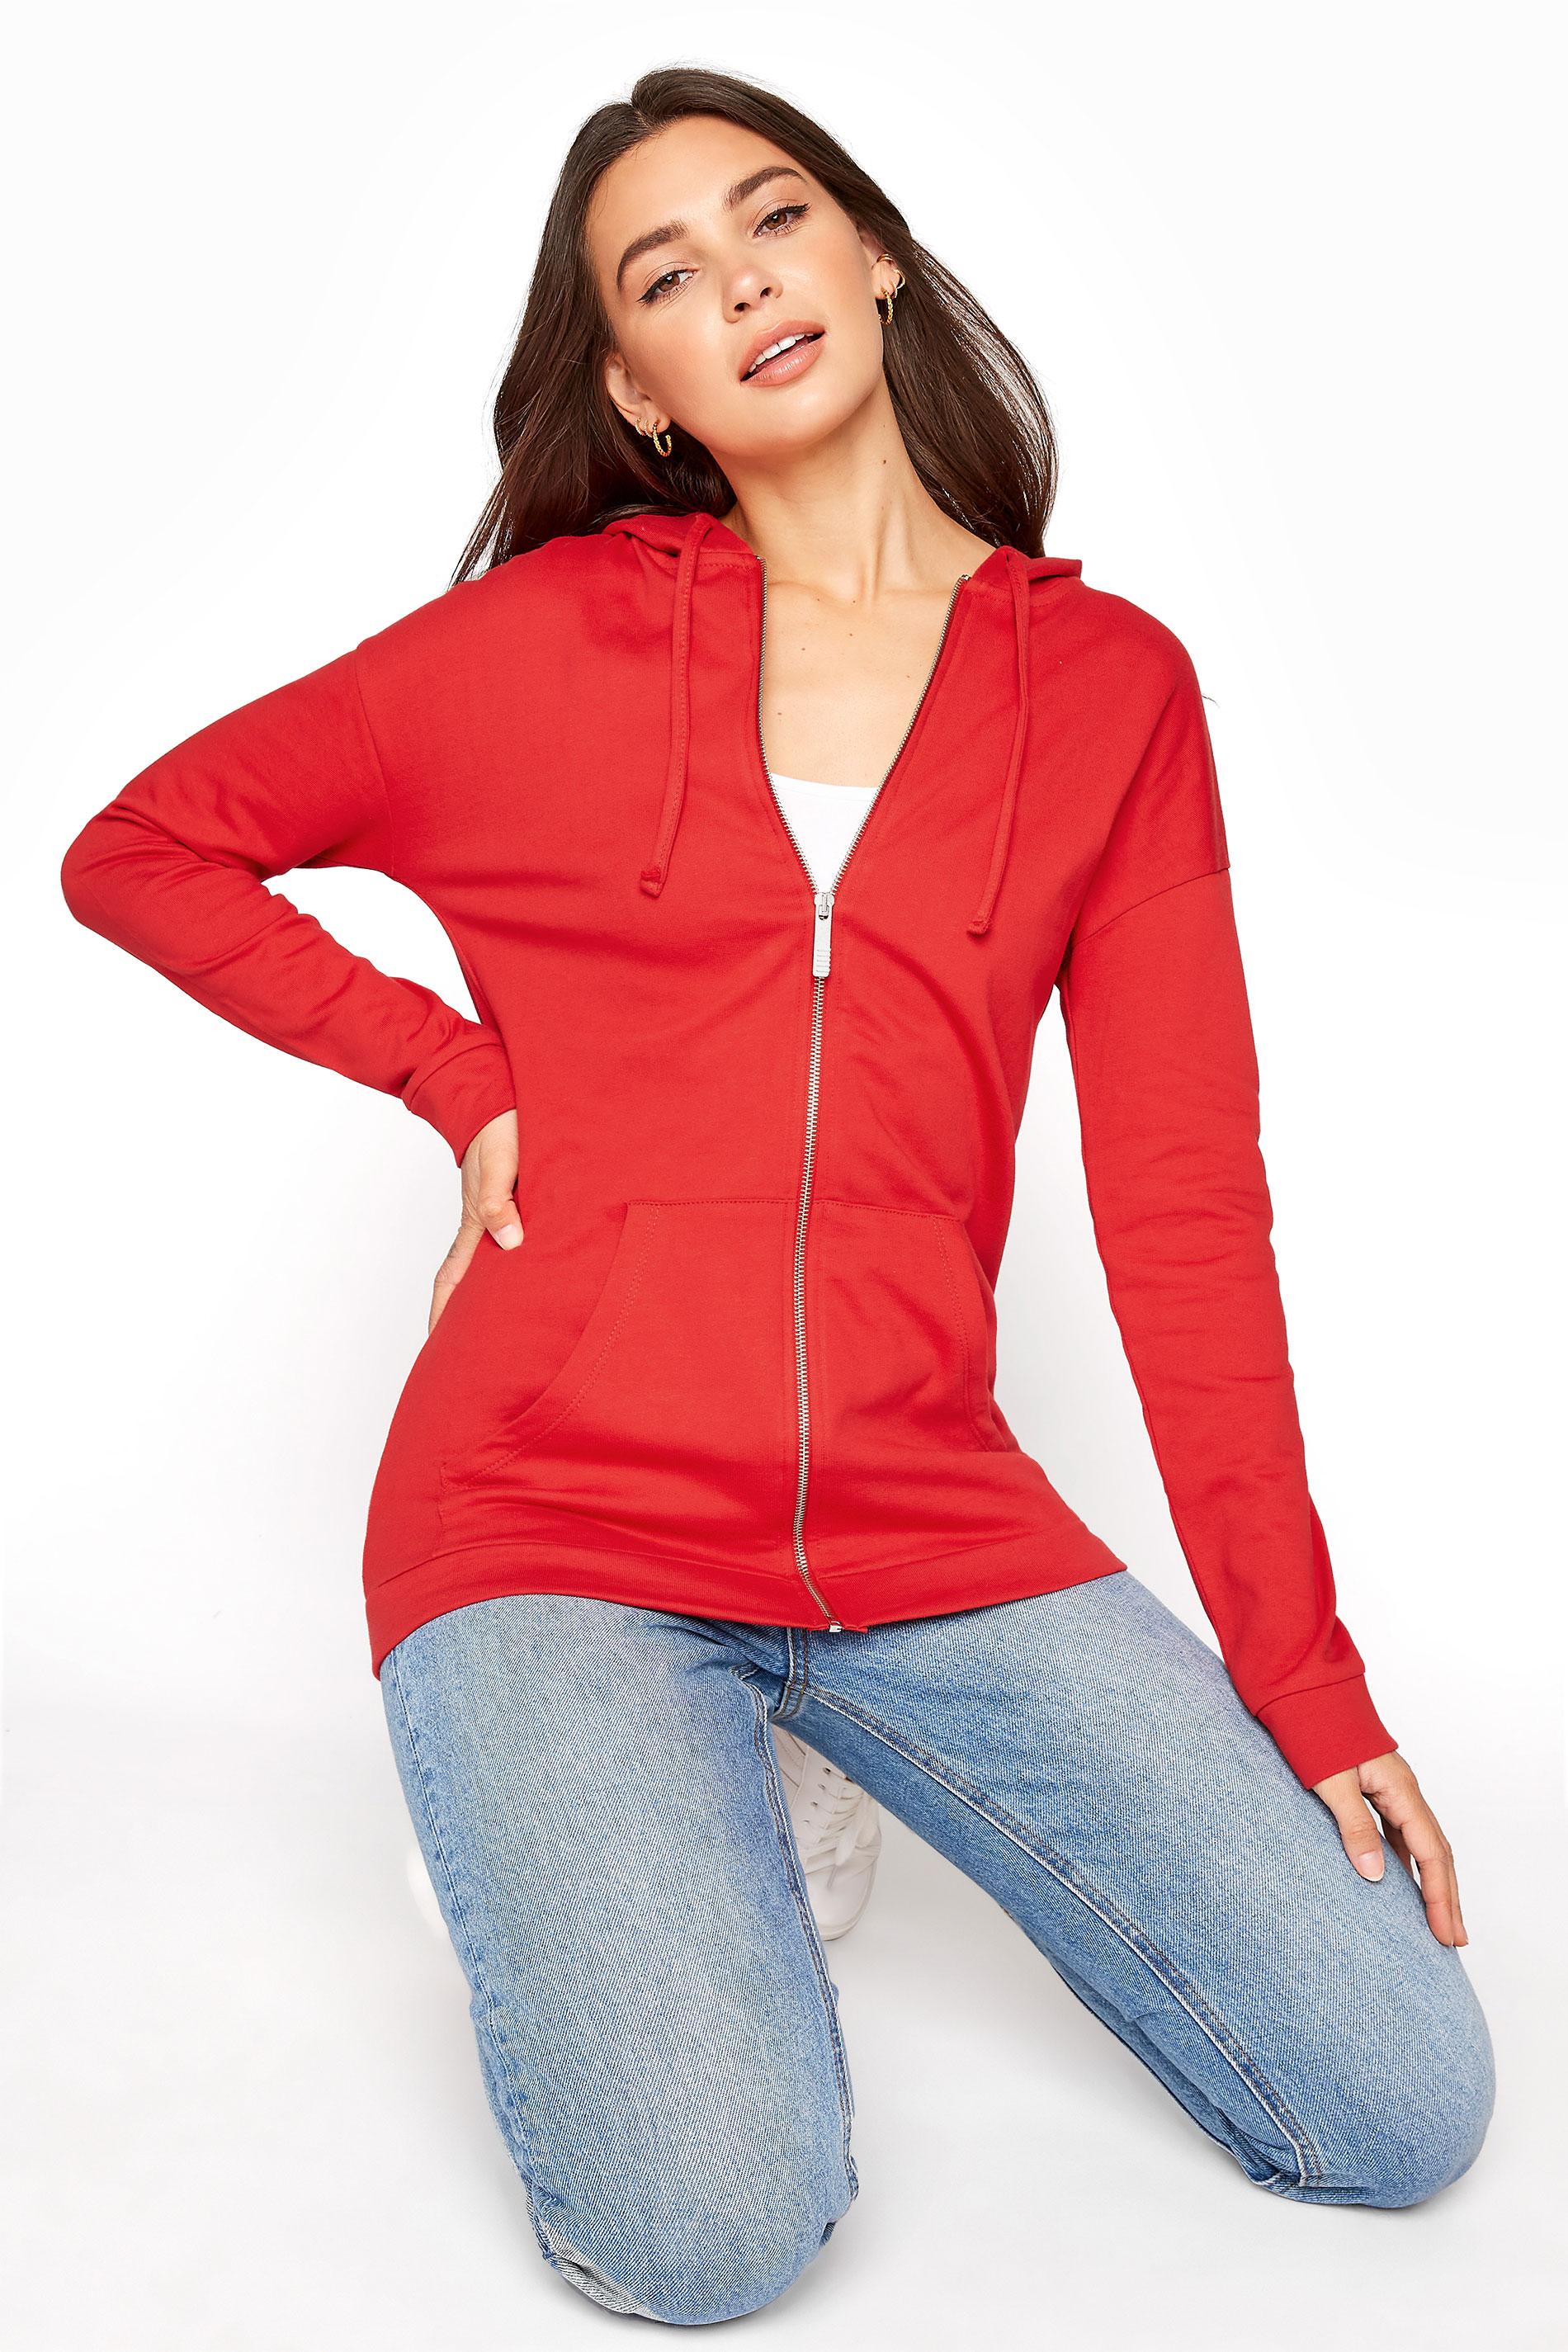 LTS Bright Red Zipper Hoodie